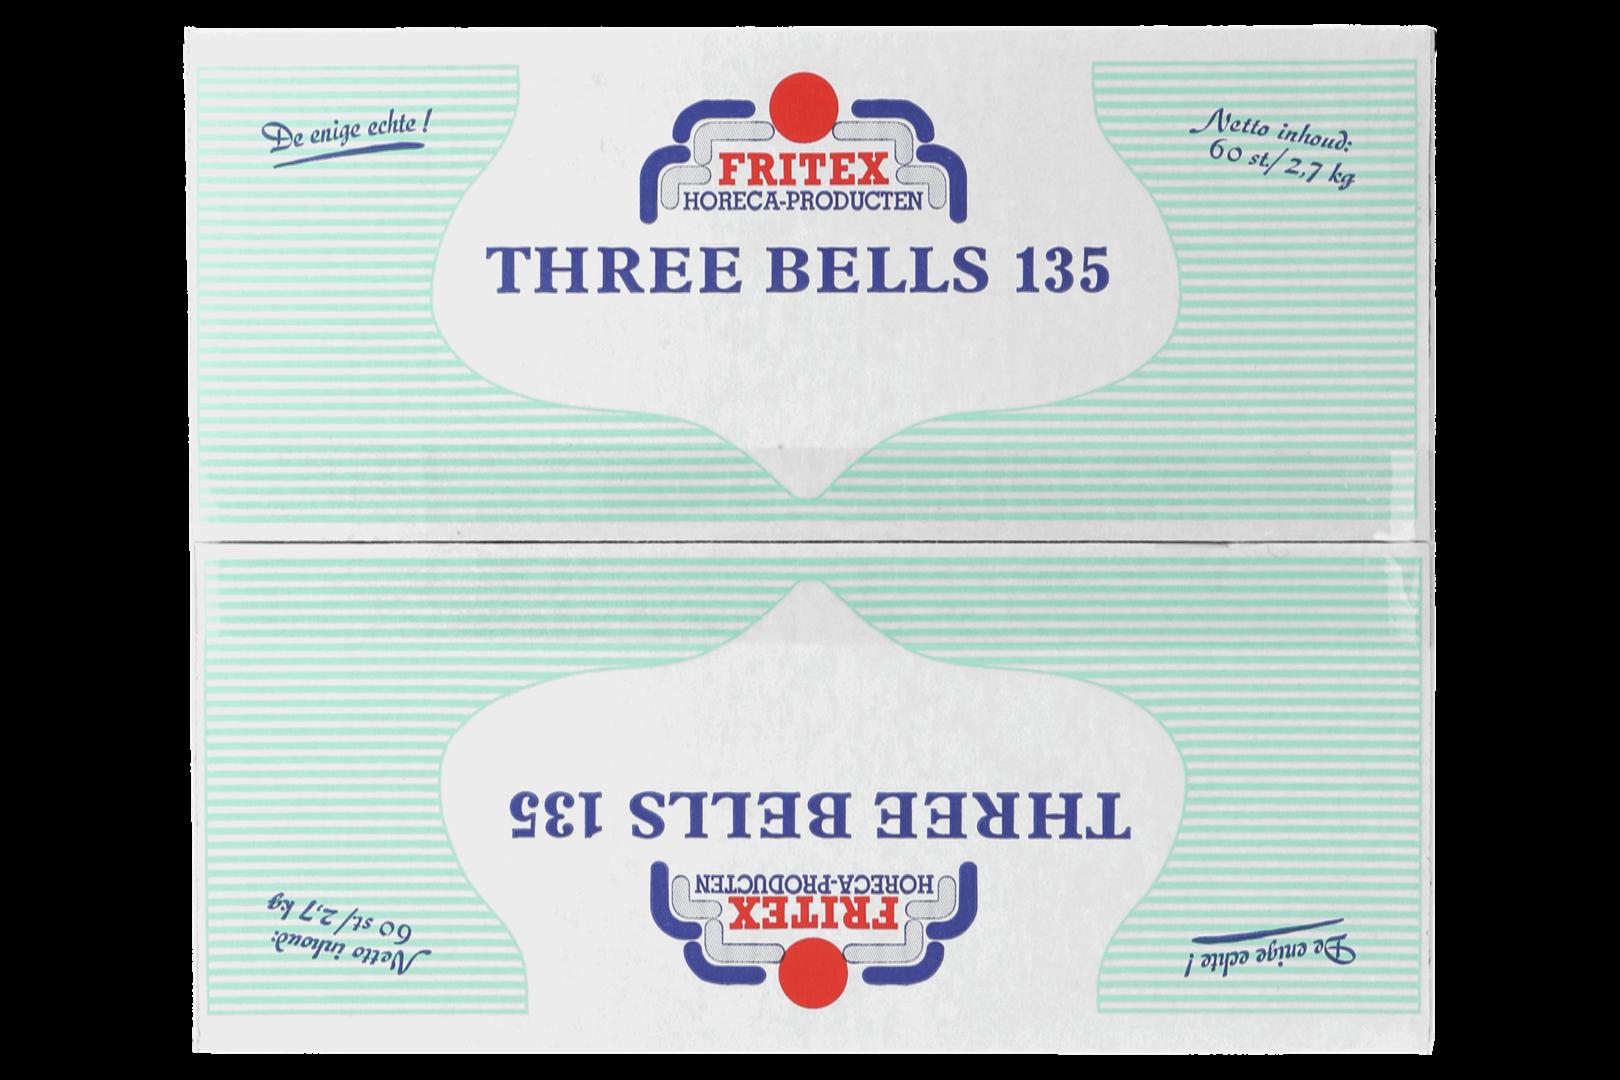 Productafbeelding Three Bells Fritex 60x45 gr